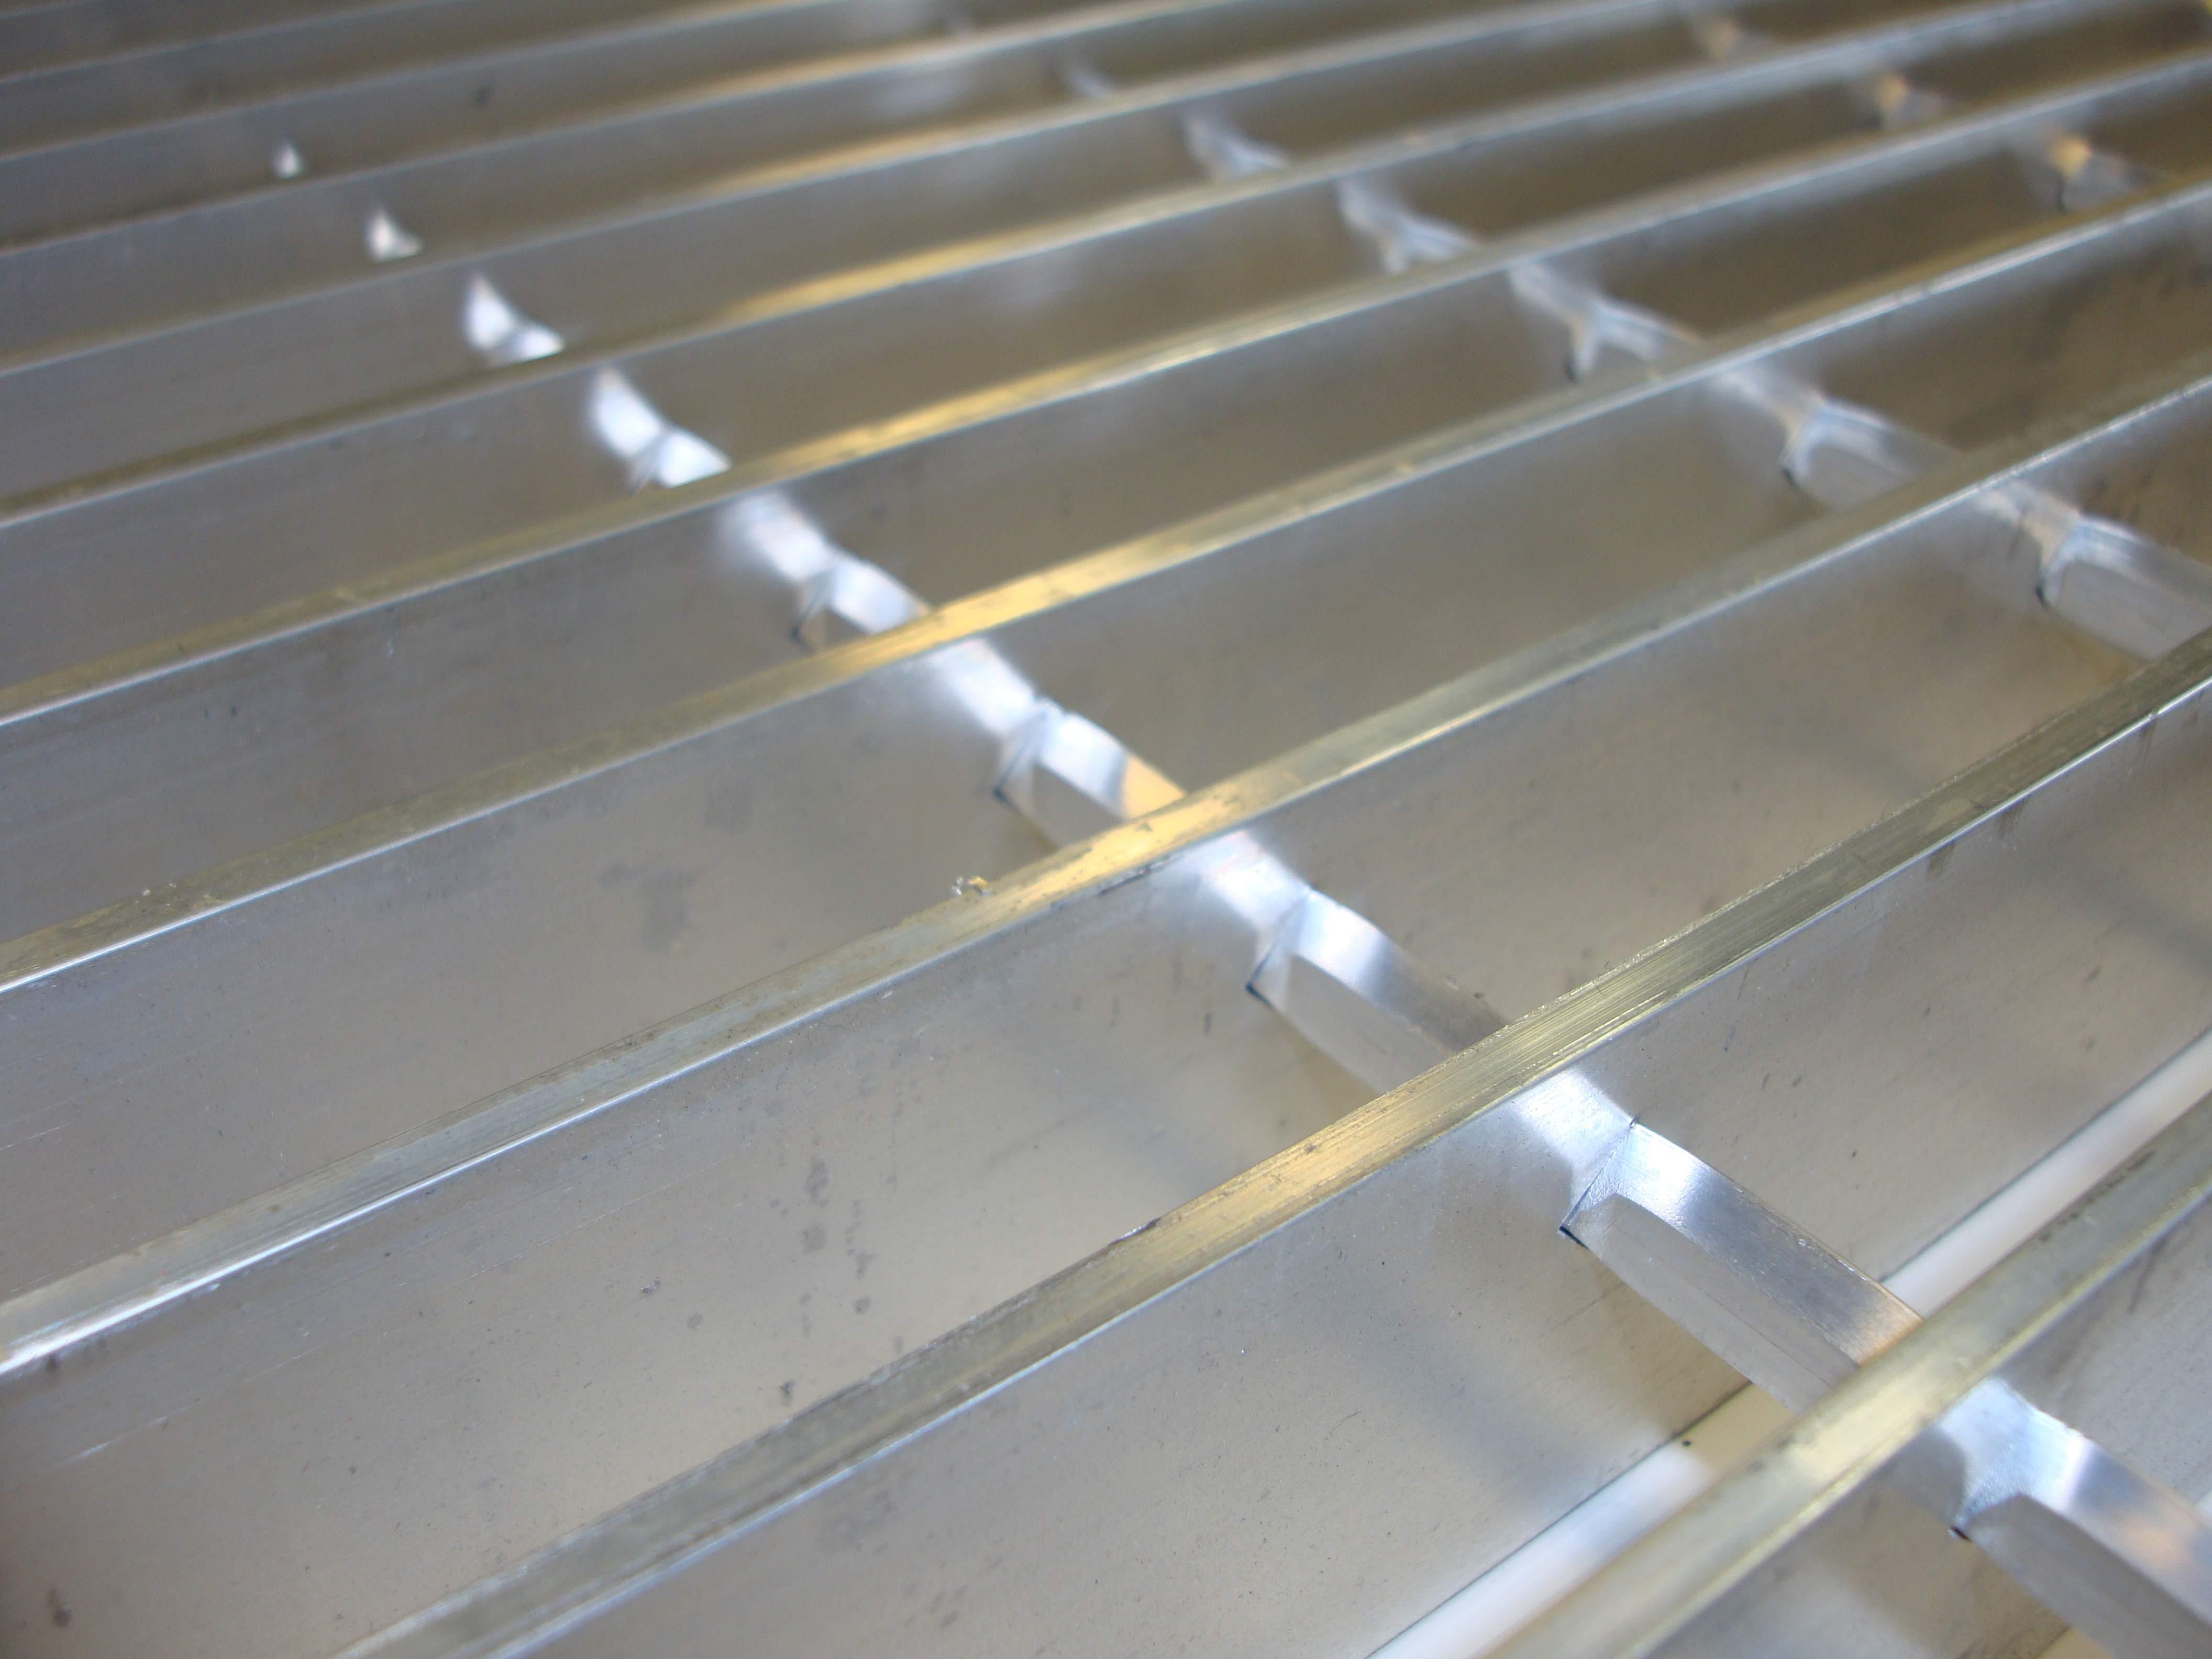 Walkway Grating 4 X 48 X 96 X 20 Tampa Steel Supply